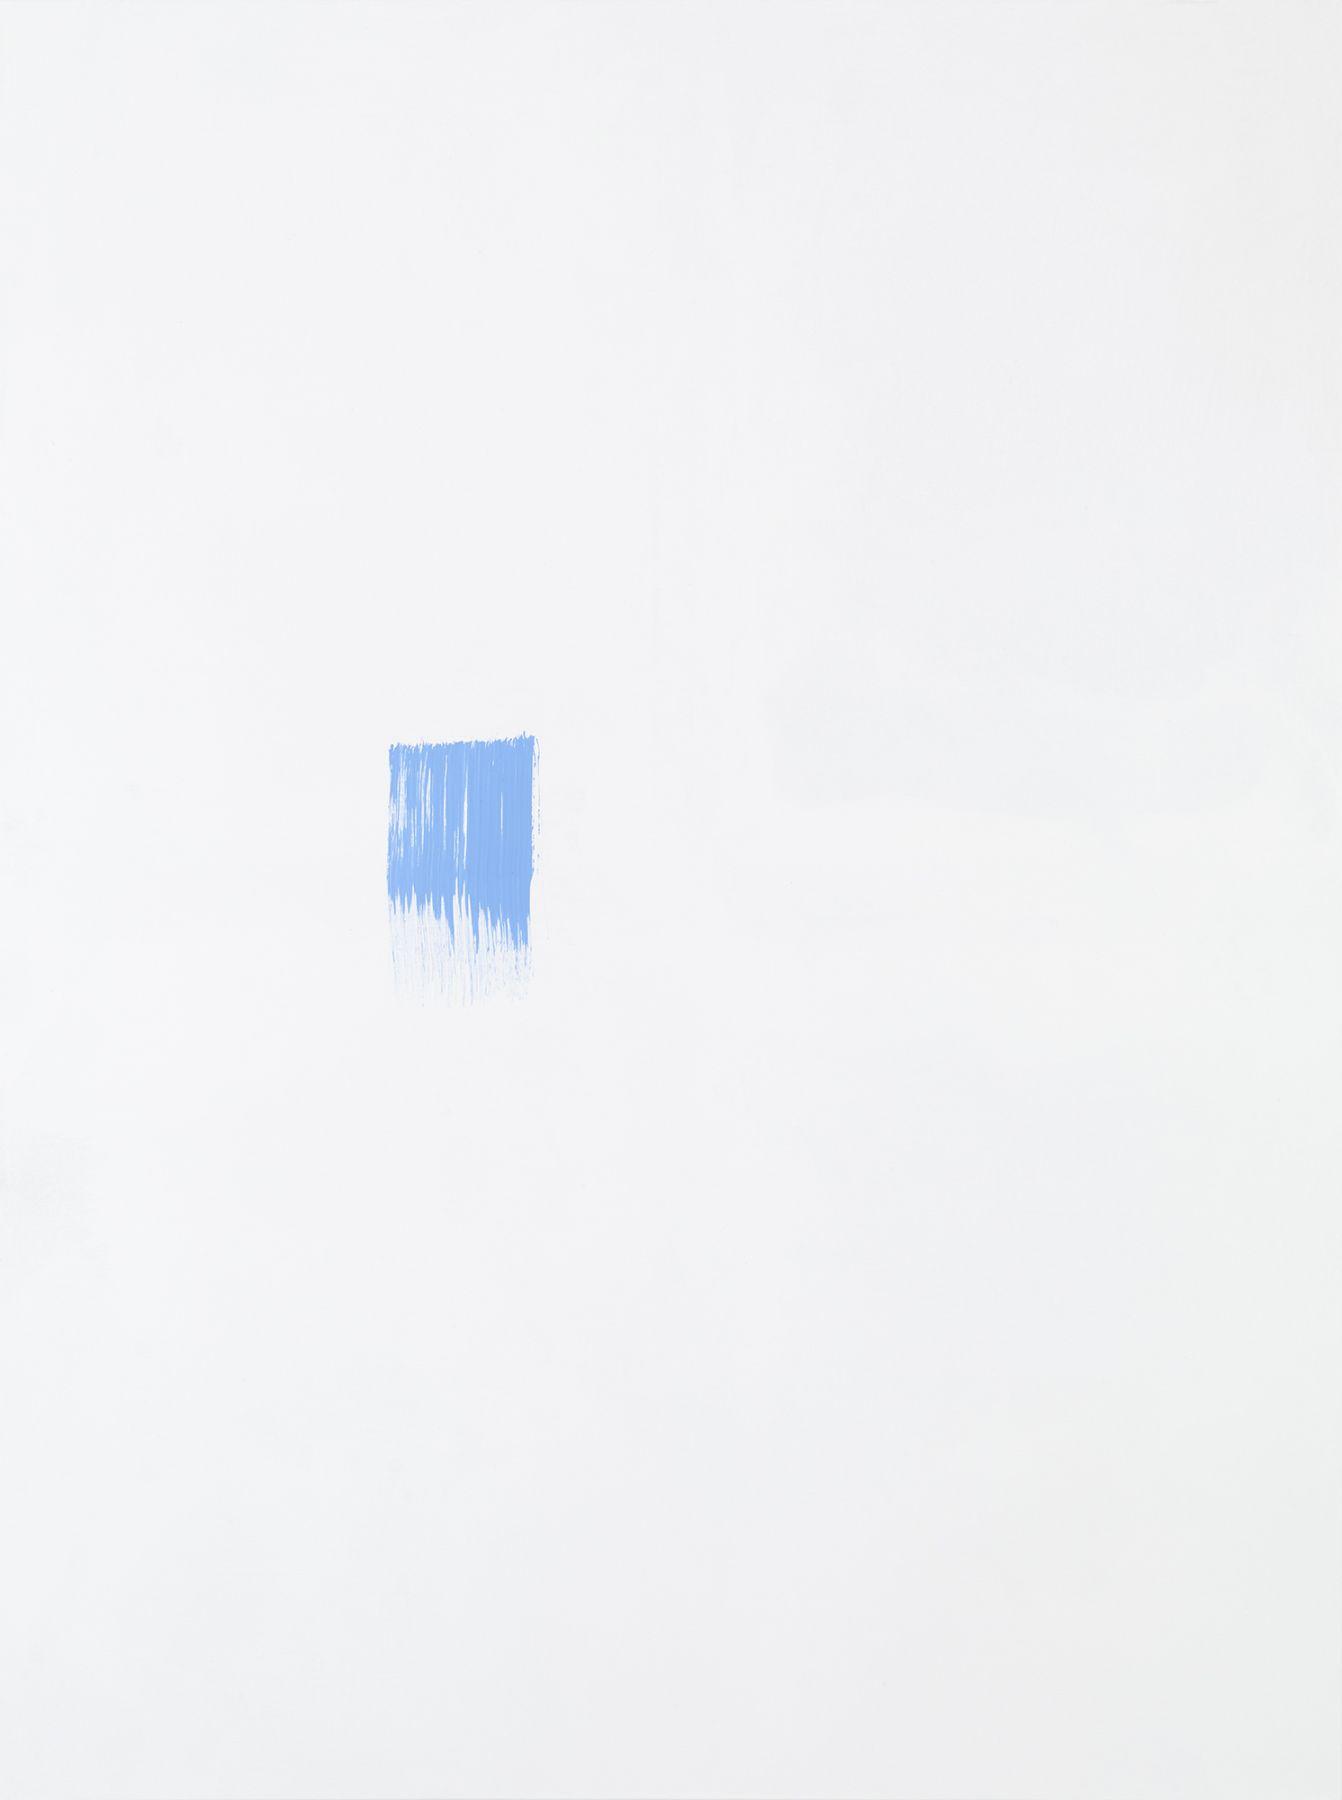 Michael Krebber MK.305, 2015 Acrylic on canvas  78 3/4 x 59 1/8 inches (200 x 150.2 cm) (